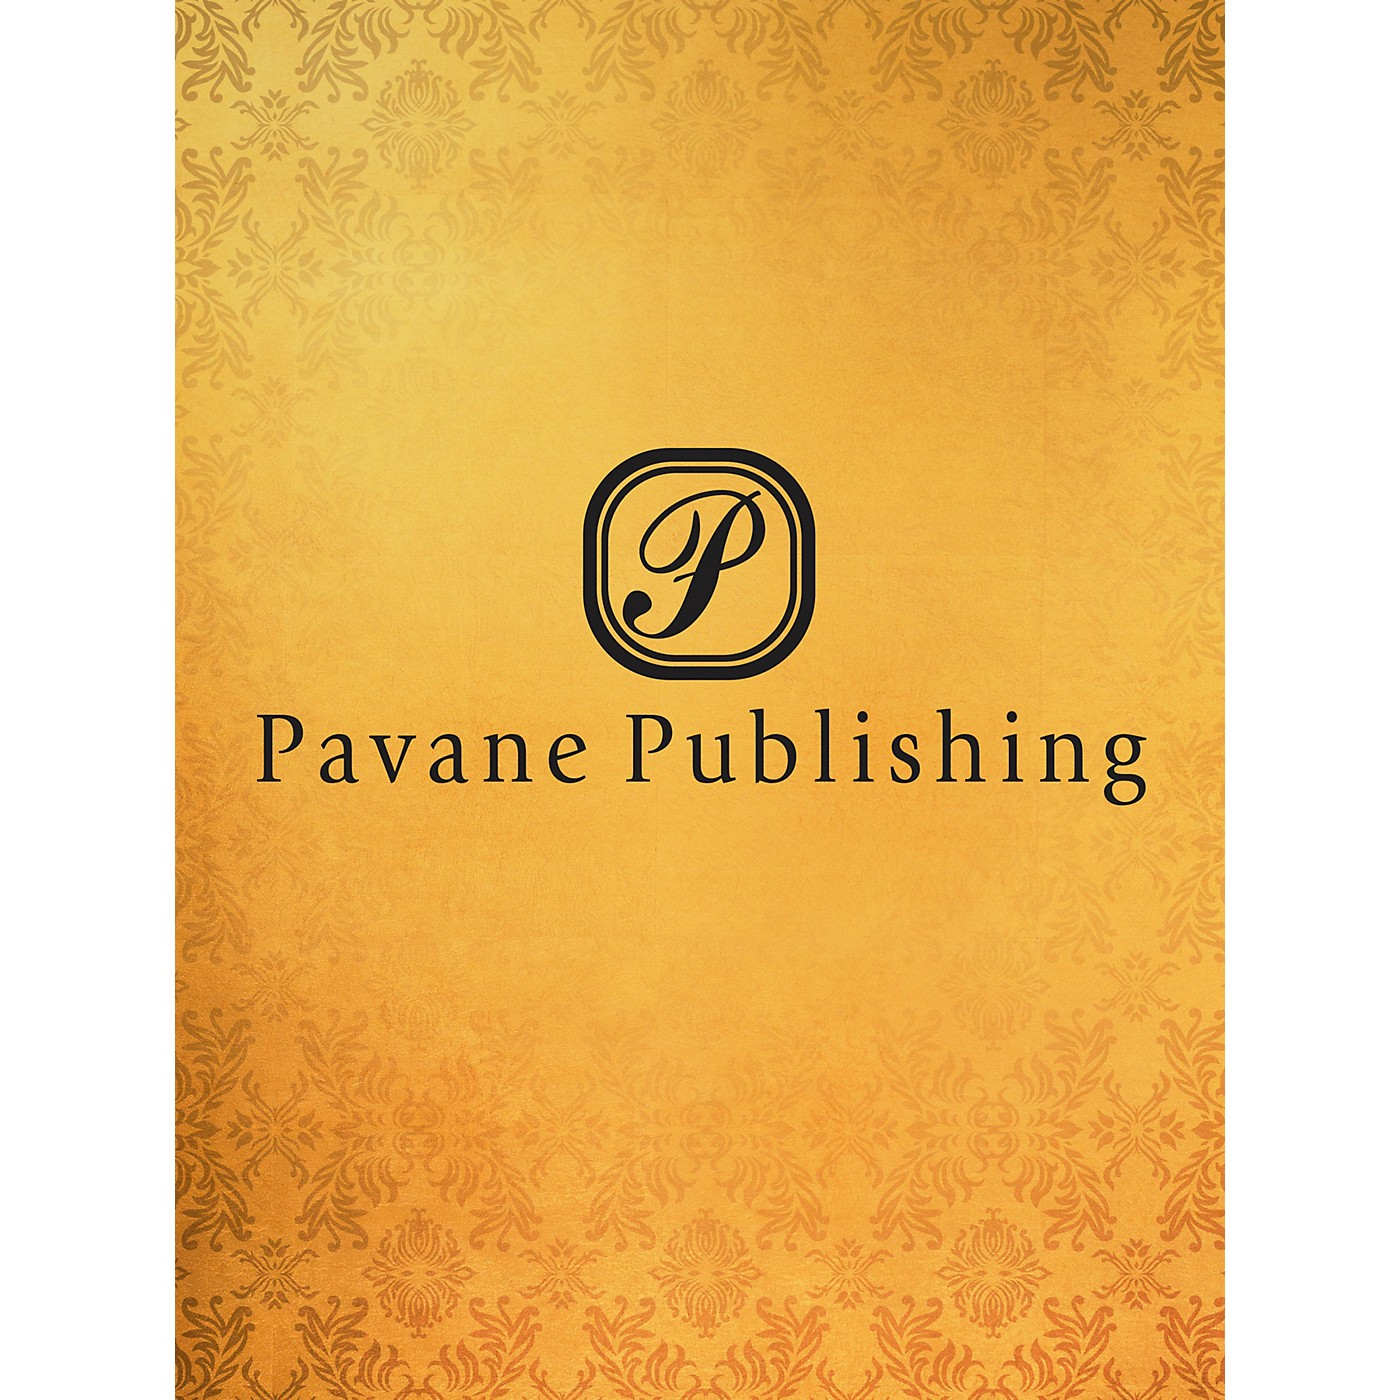 Pavane Two Patriotic Songs for Male Voices (TTBB a cappella) TTBB Arranged by David C. Dickau thumbnail